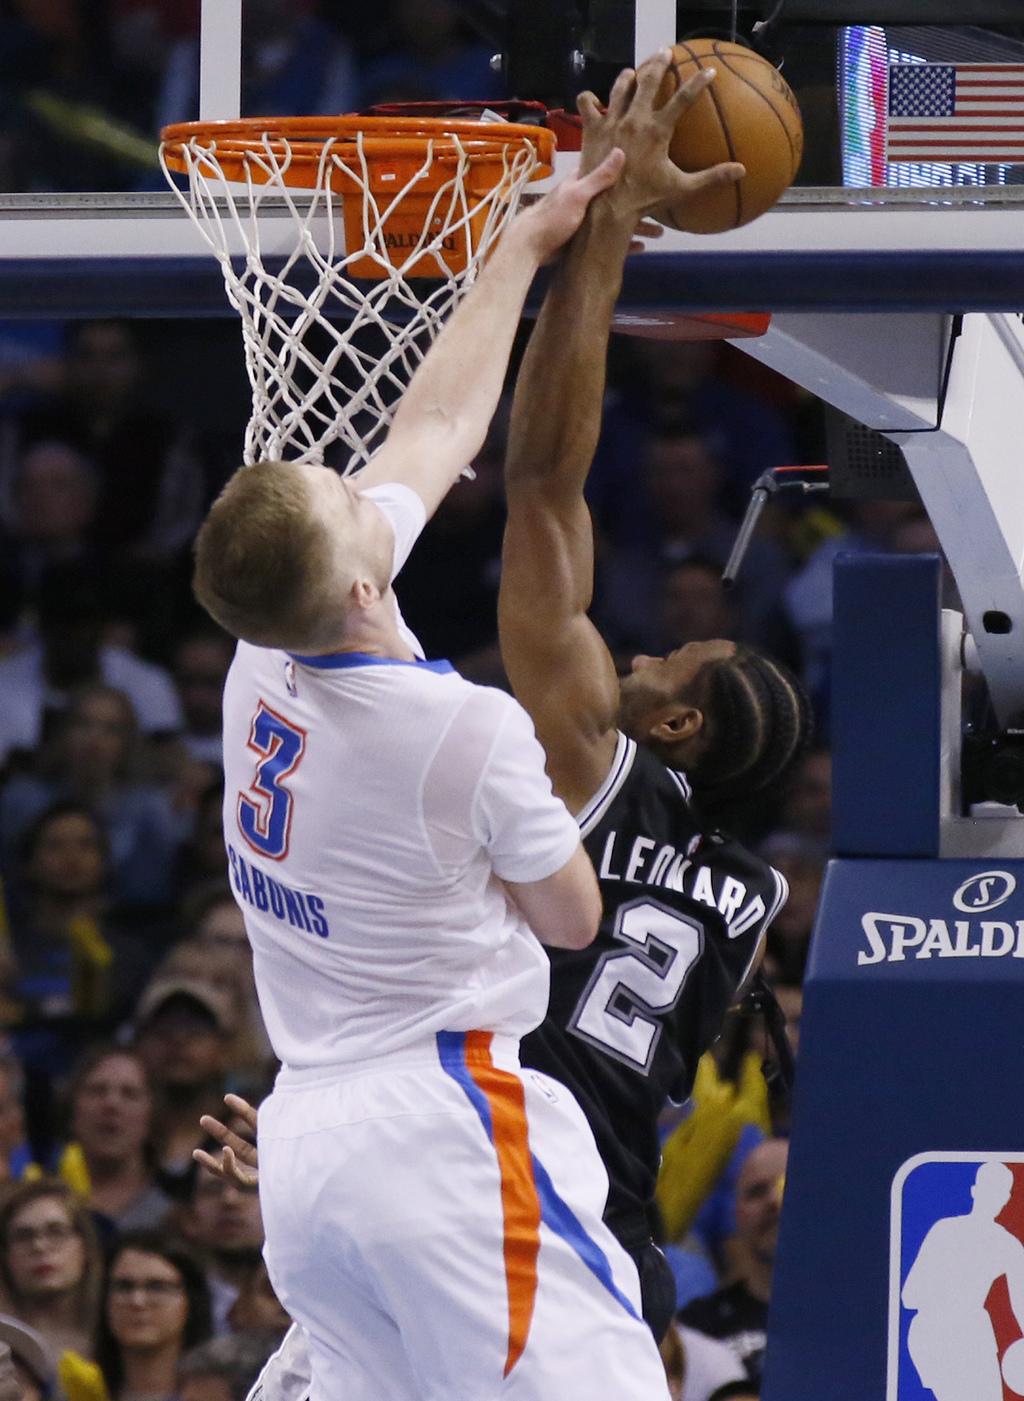 San Antonio Spurs forward Kawhi Leonard (2) is fouled by Oklahoma City Thunder forward Domantas Sabonis (3) as he shoots during the sec...